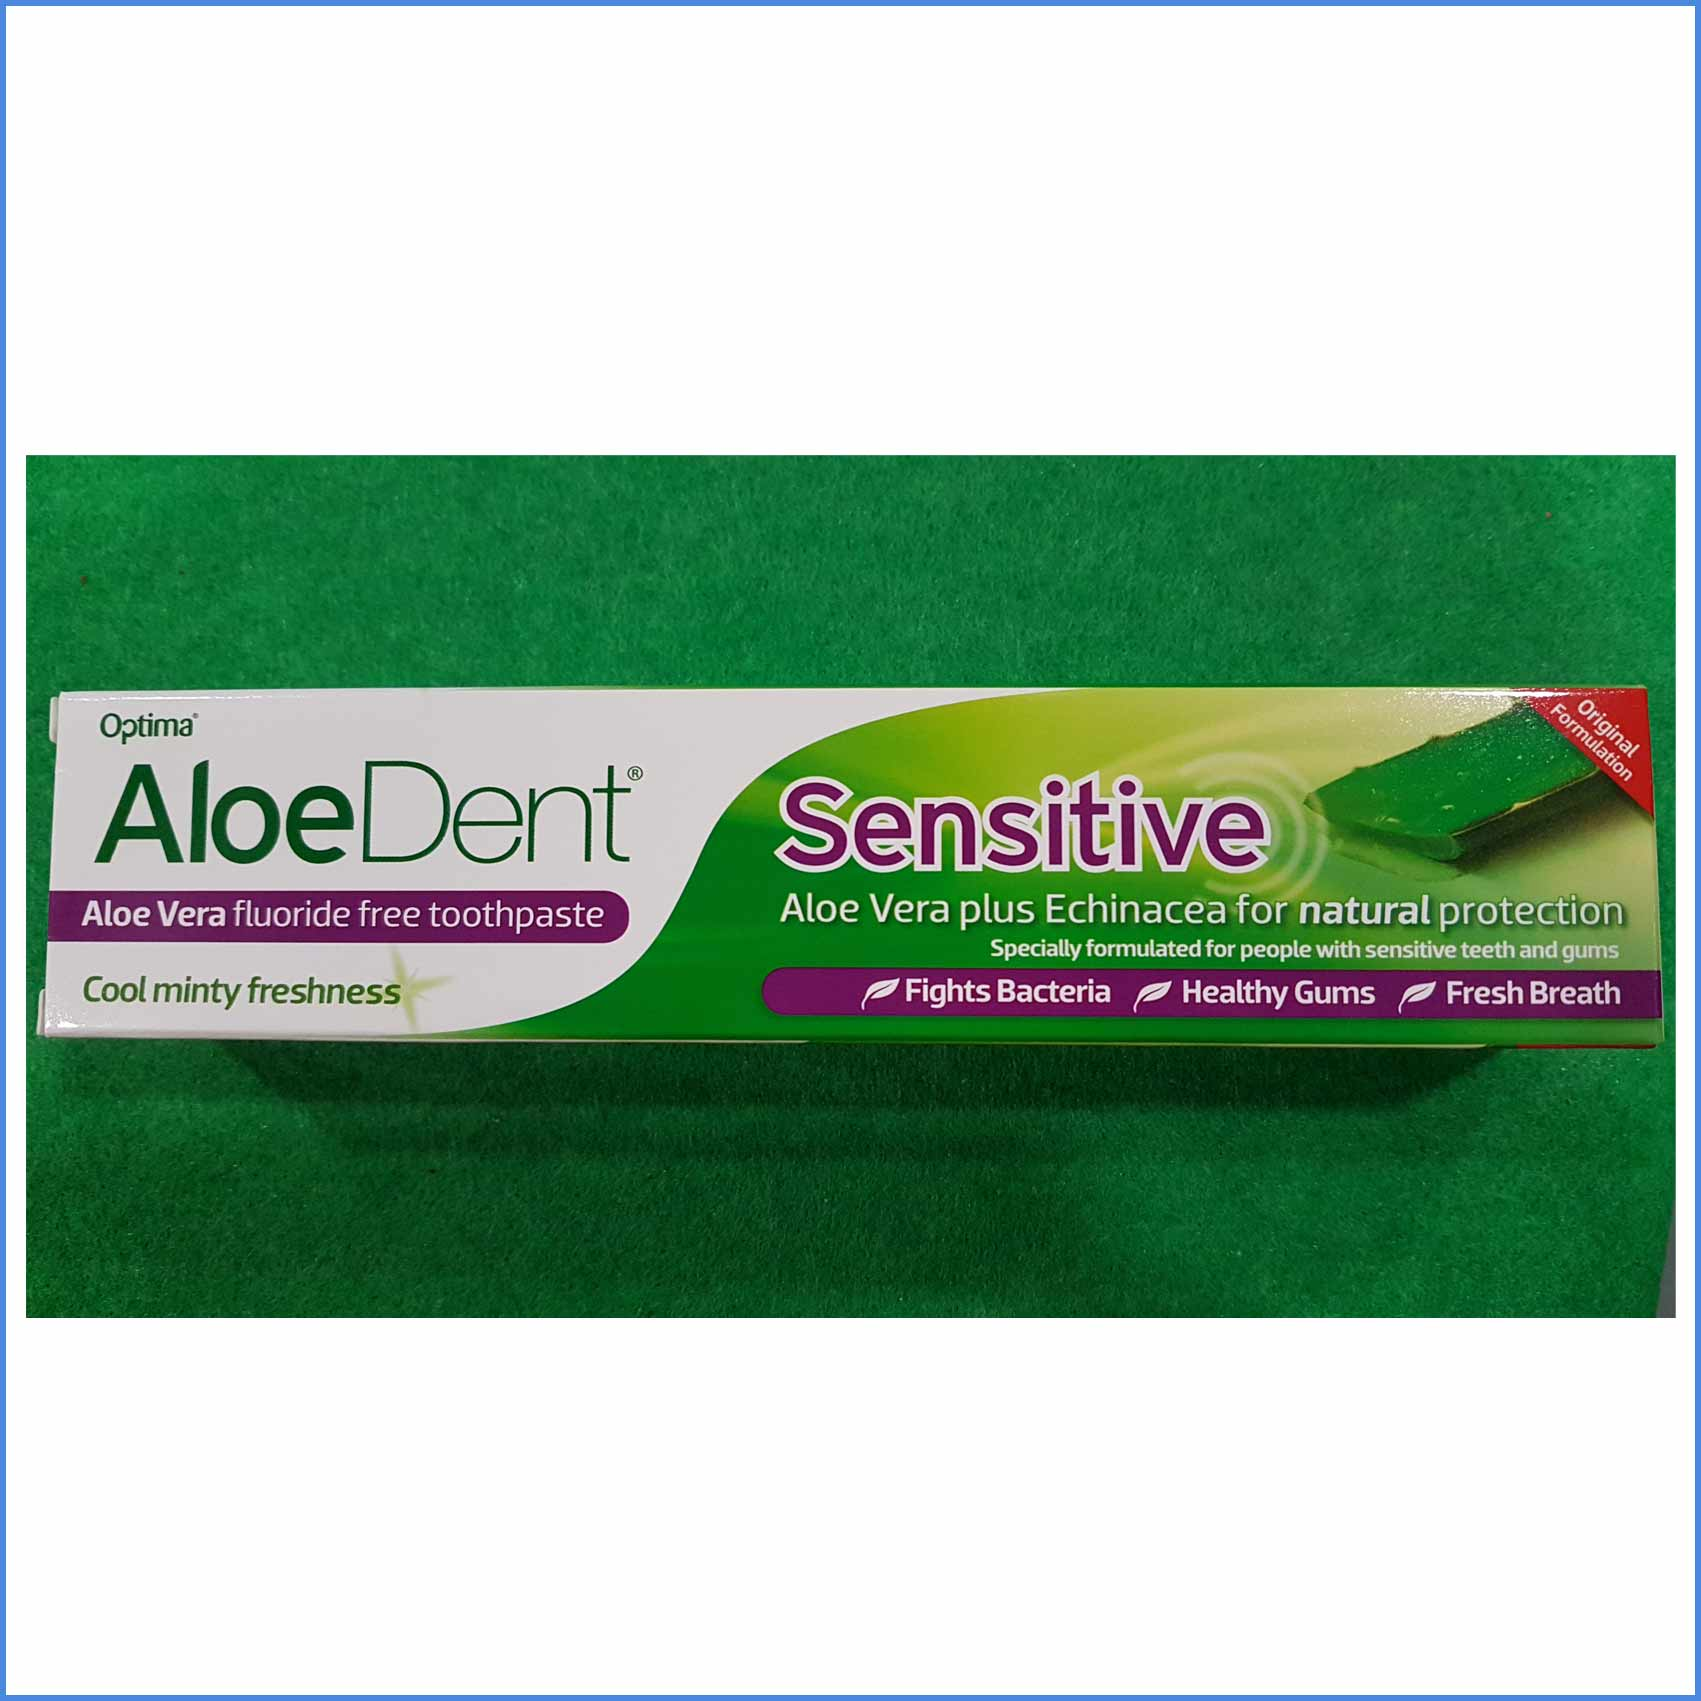 AloeDent Sensitive Toothpaste